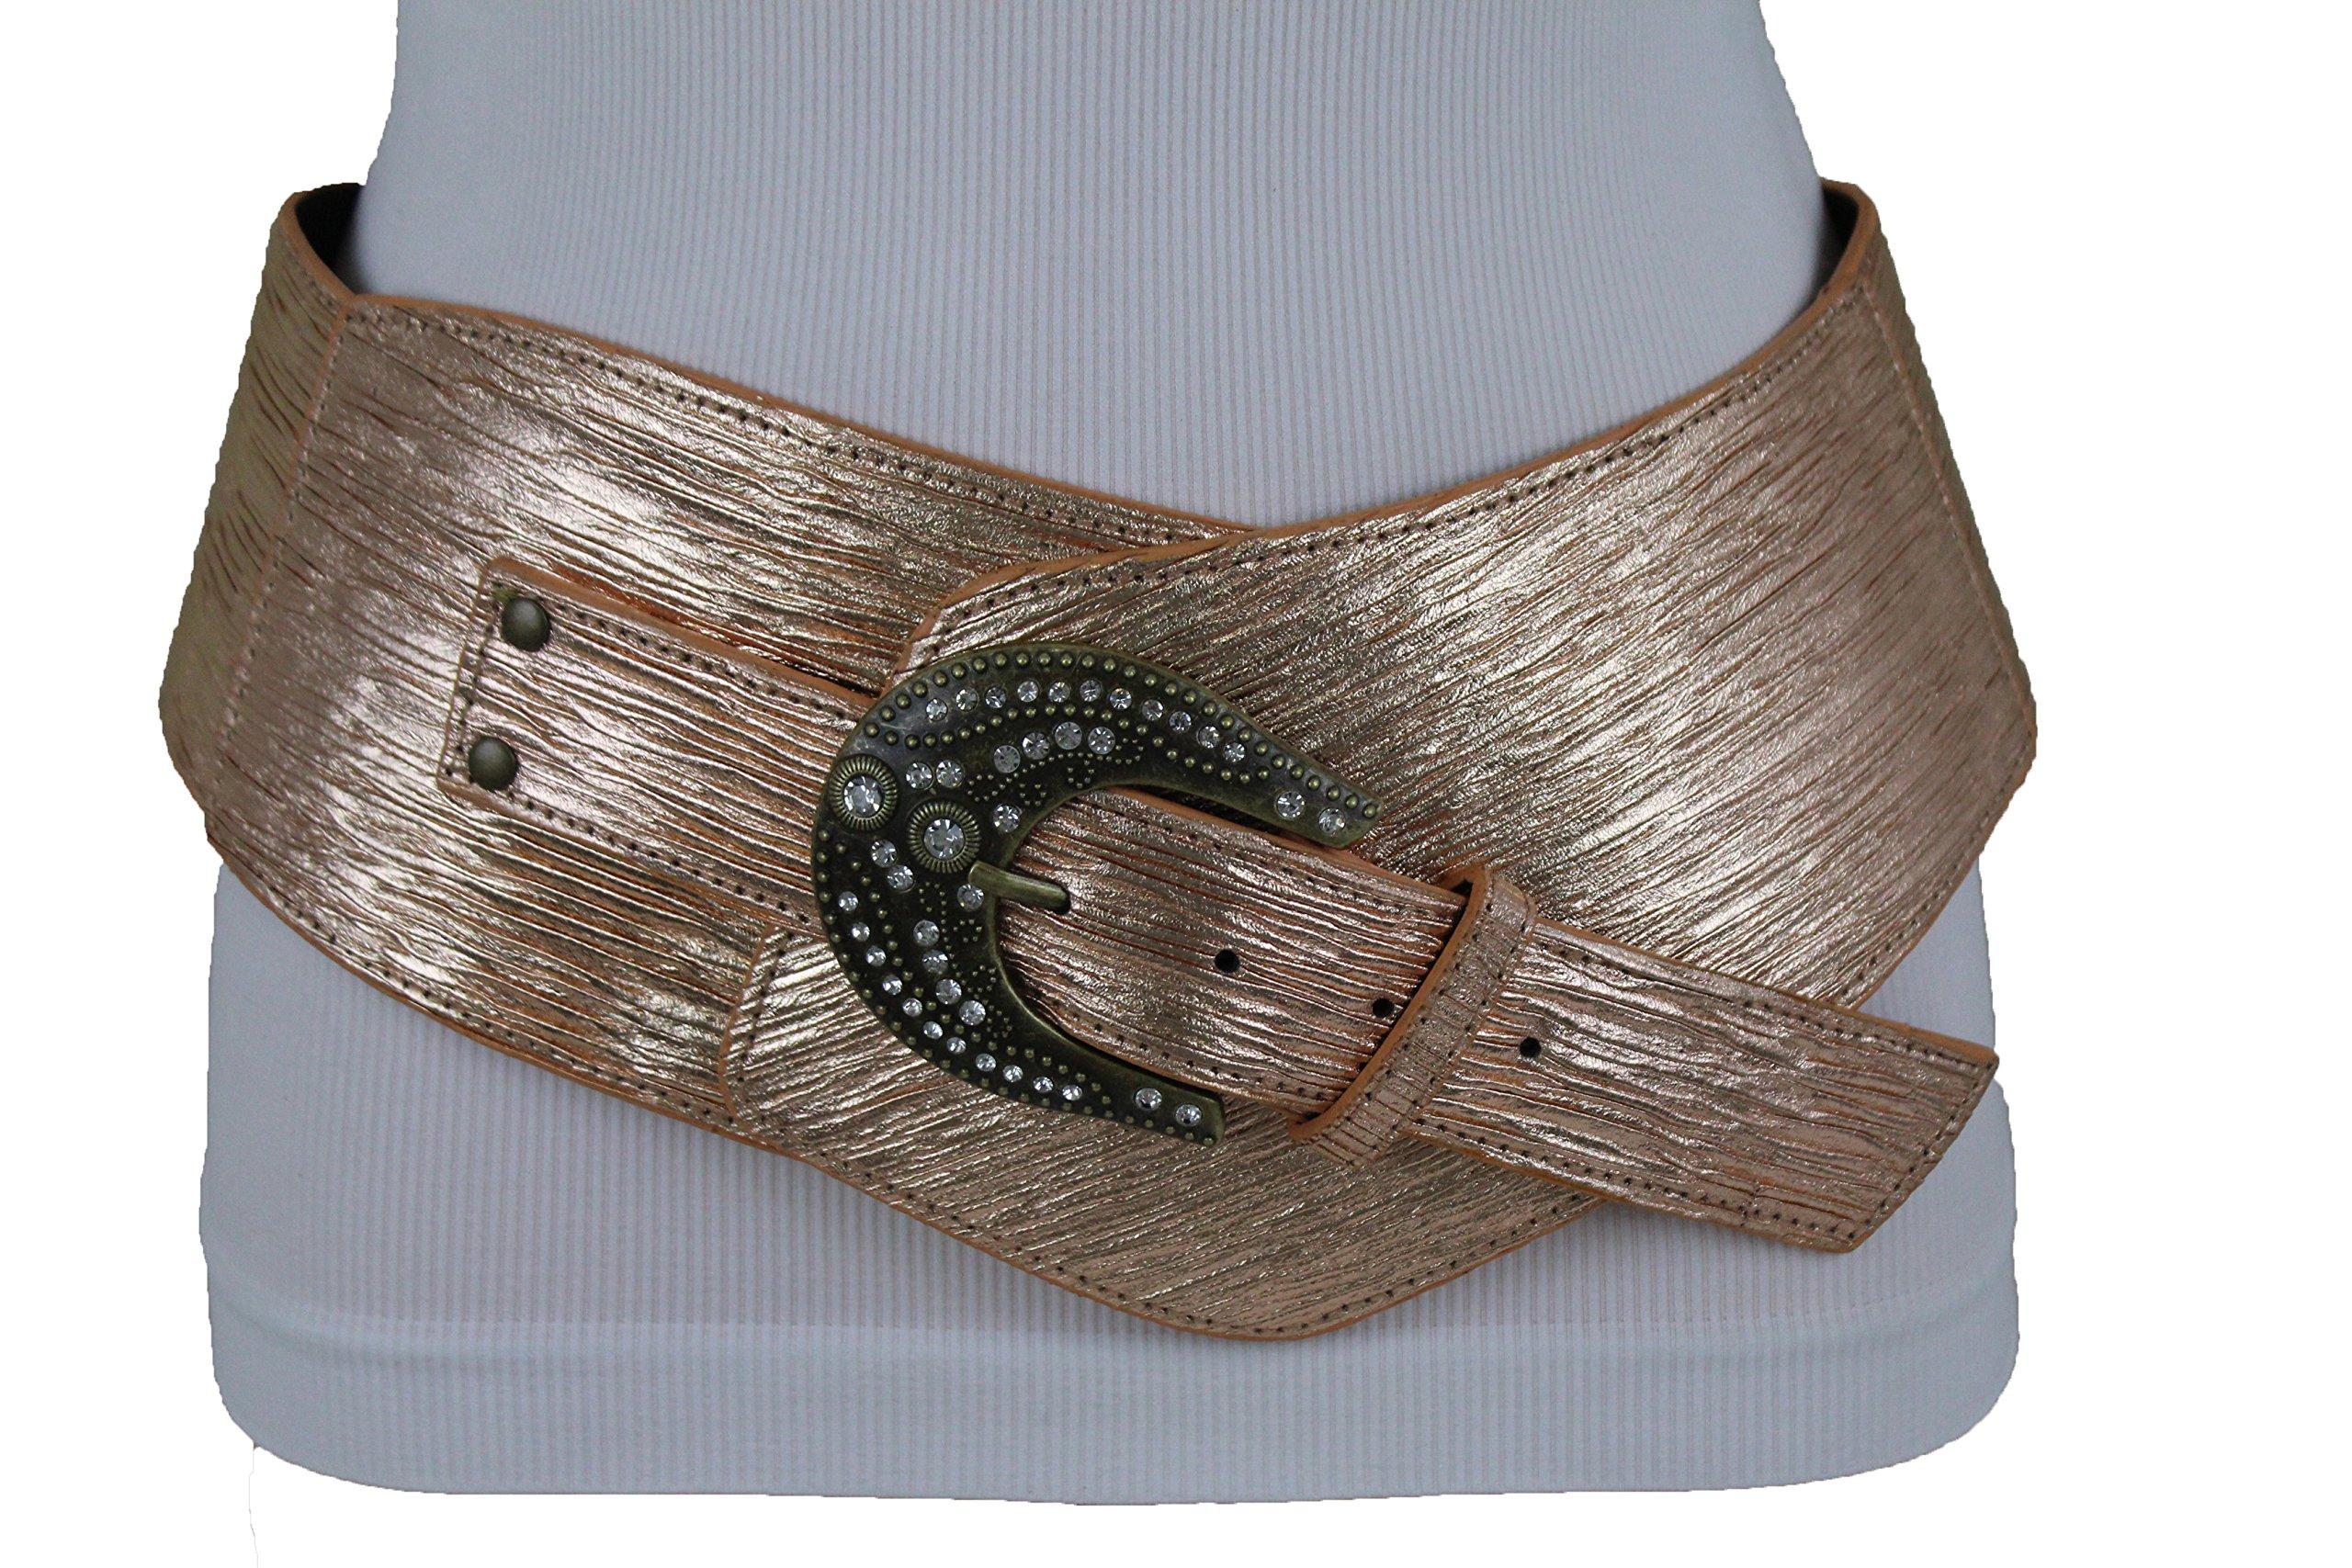 TFJ Women Extra Wide Western Fashion Hip Belt Big Metal Buckle Beads Studs Silver S M L Xl (Rose Gold S/M 33''-37'')